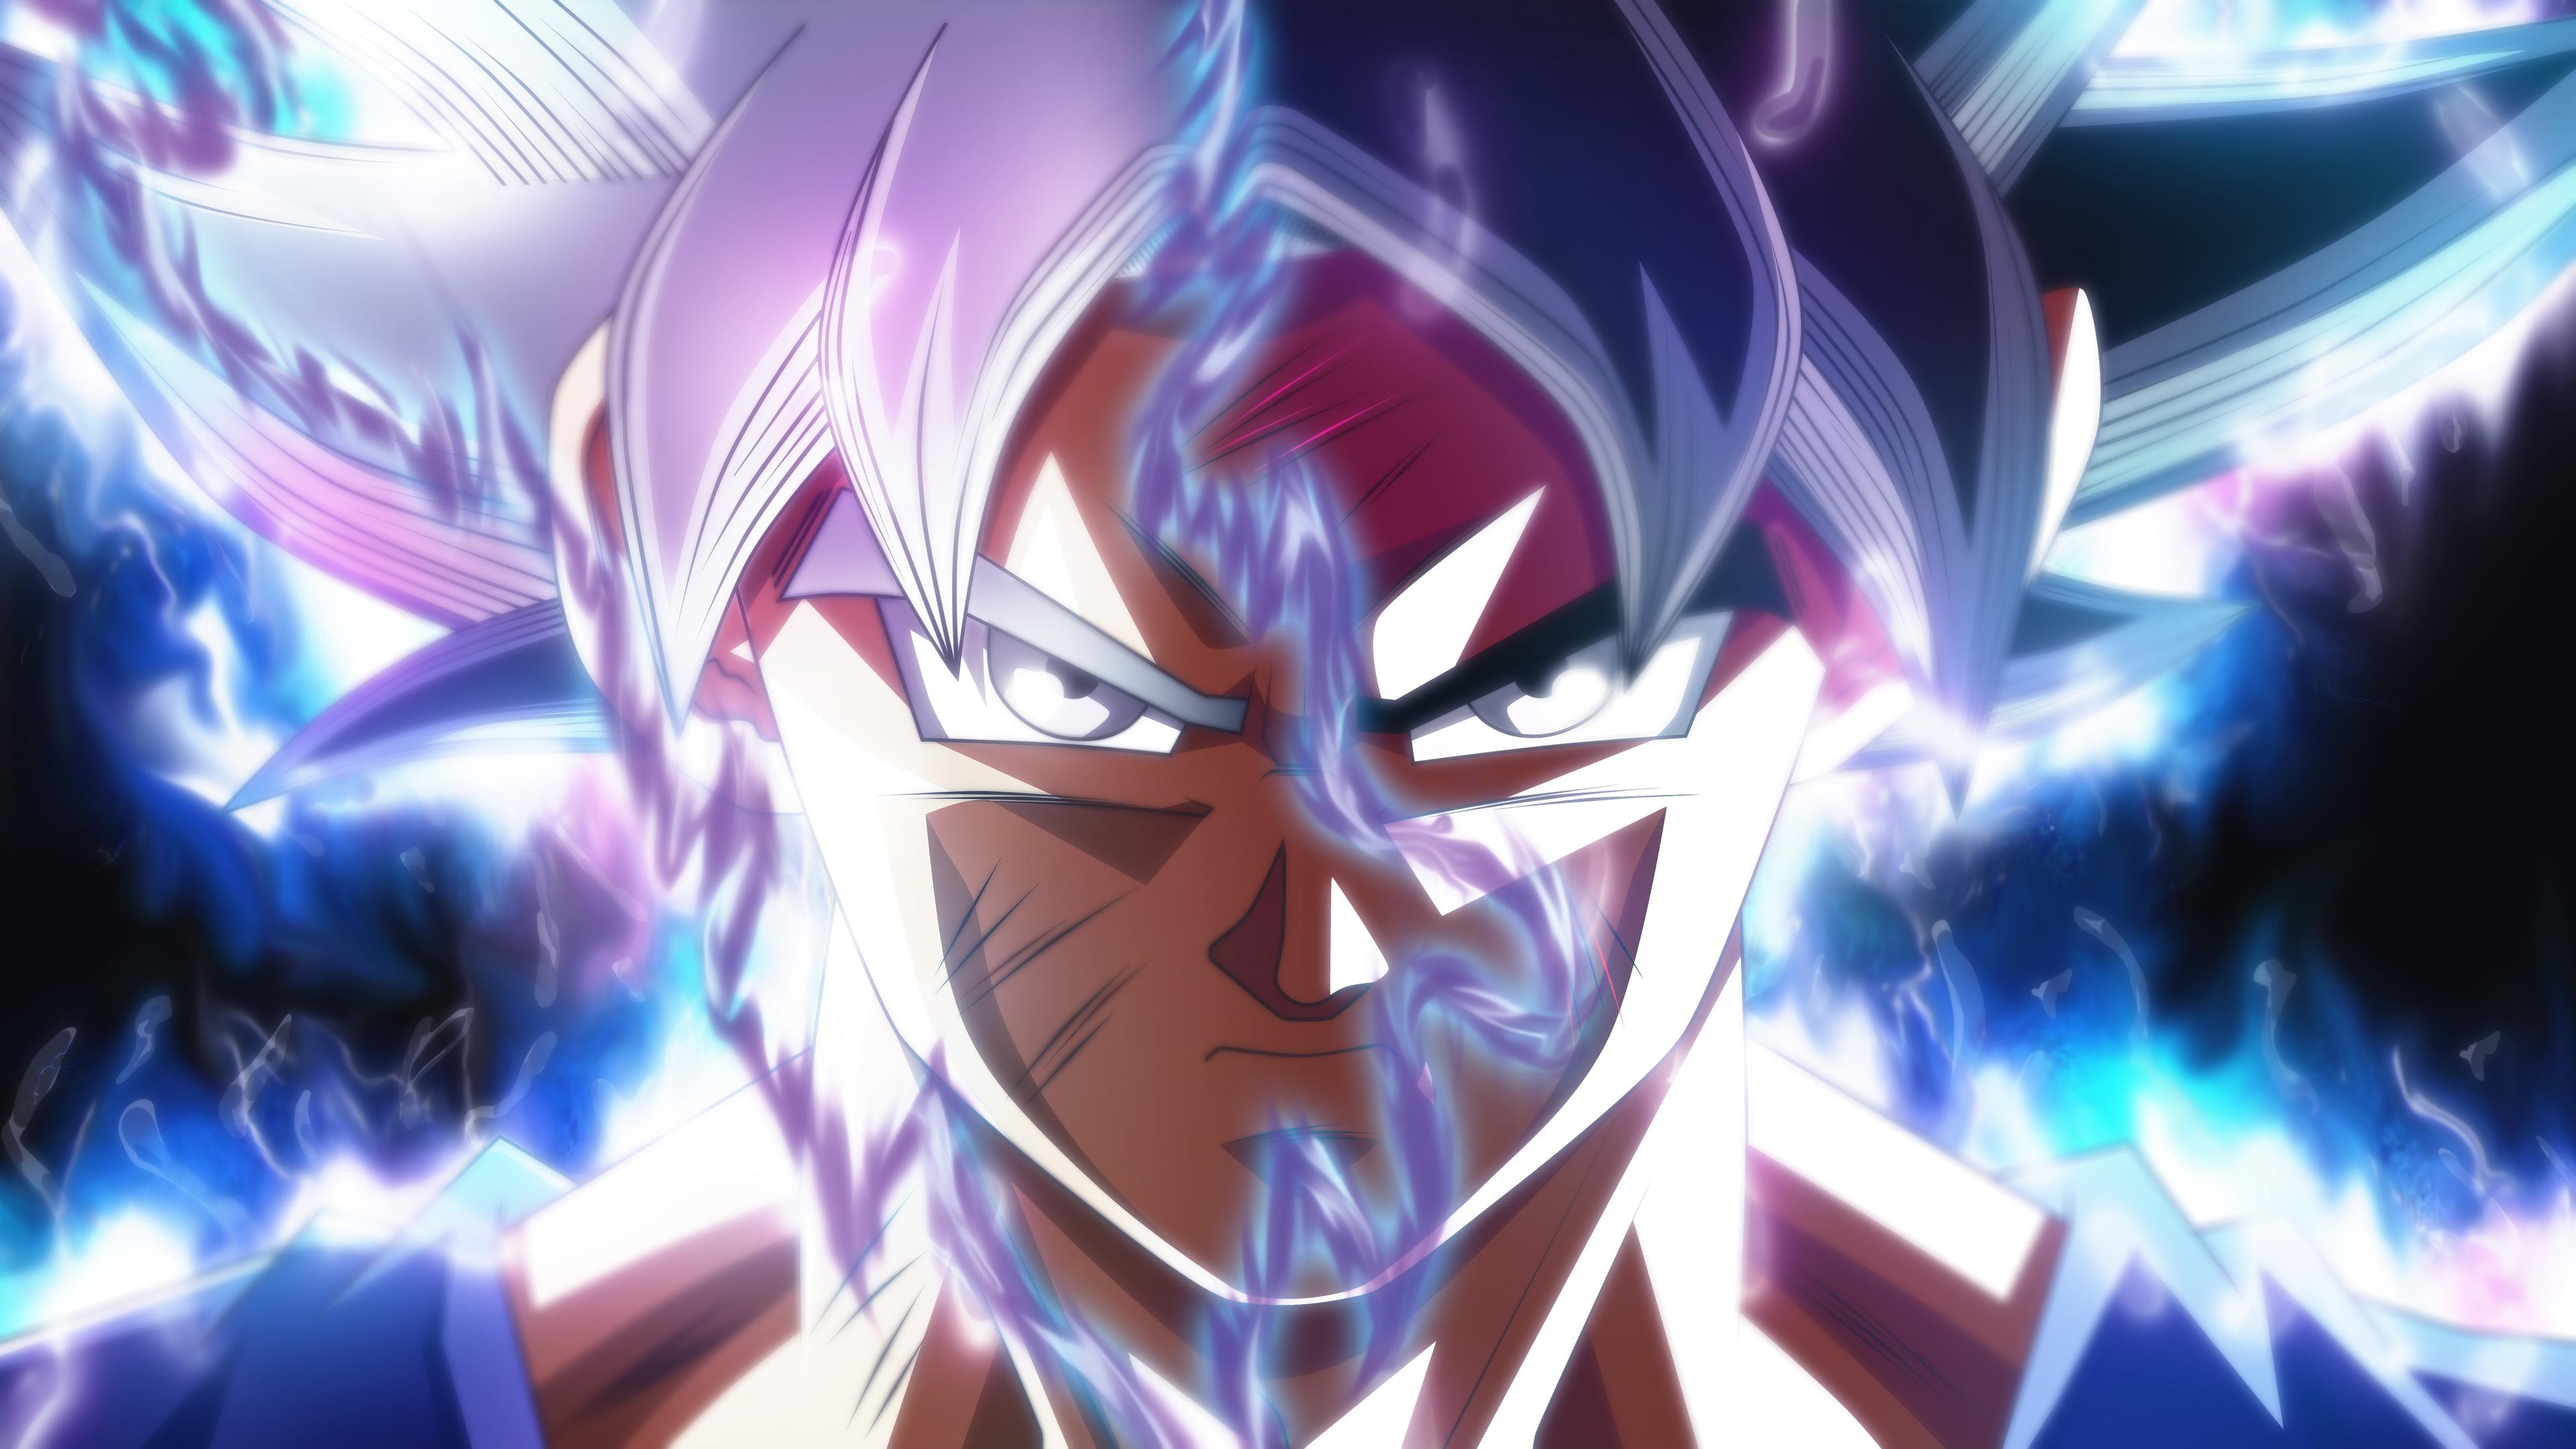 goku ultra instinct transformation 1541974328 - Goku Ultra Instinct Transformation - hd-wallpapers, goku wallpapers, dragon ball wallpapers, dragon ball super wallpapers, deviantart wallpapers, anime wallpapers, 4k-wallpapers